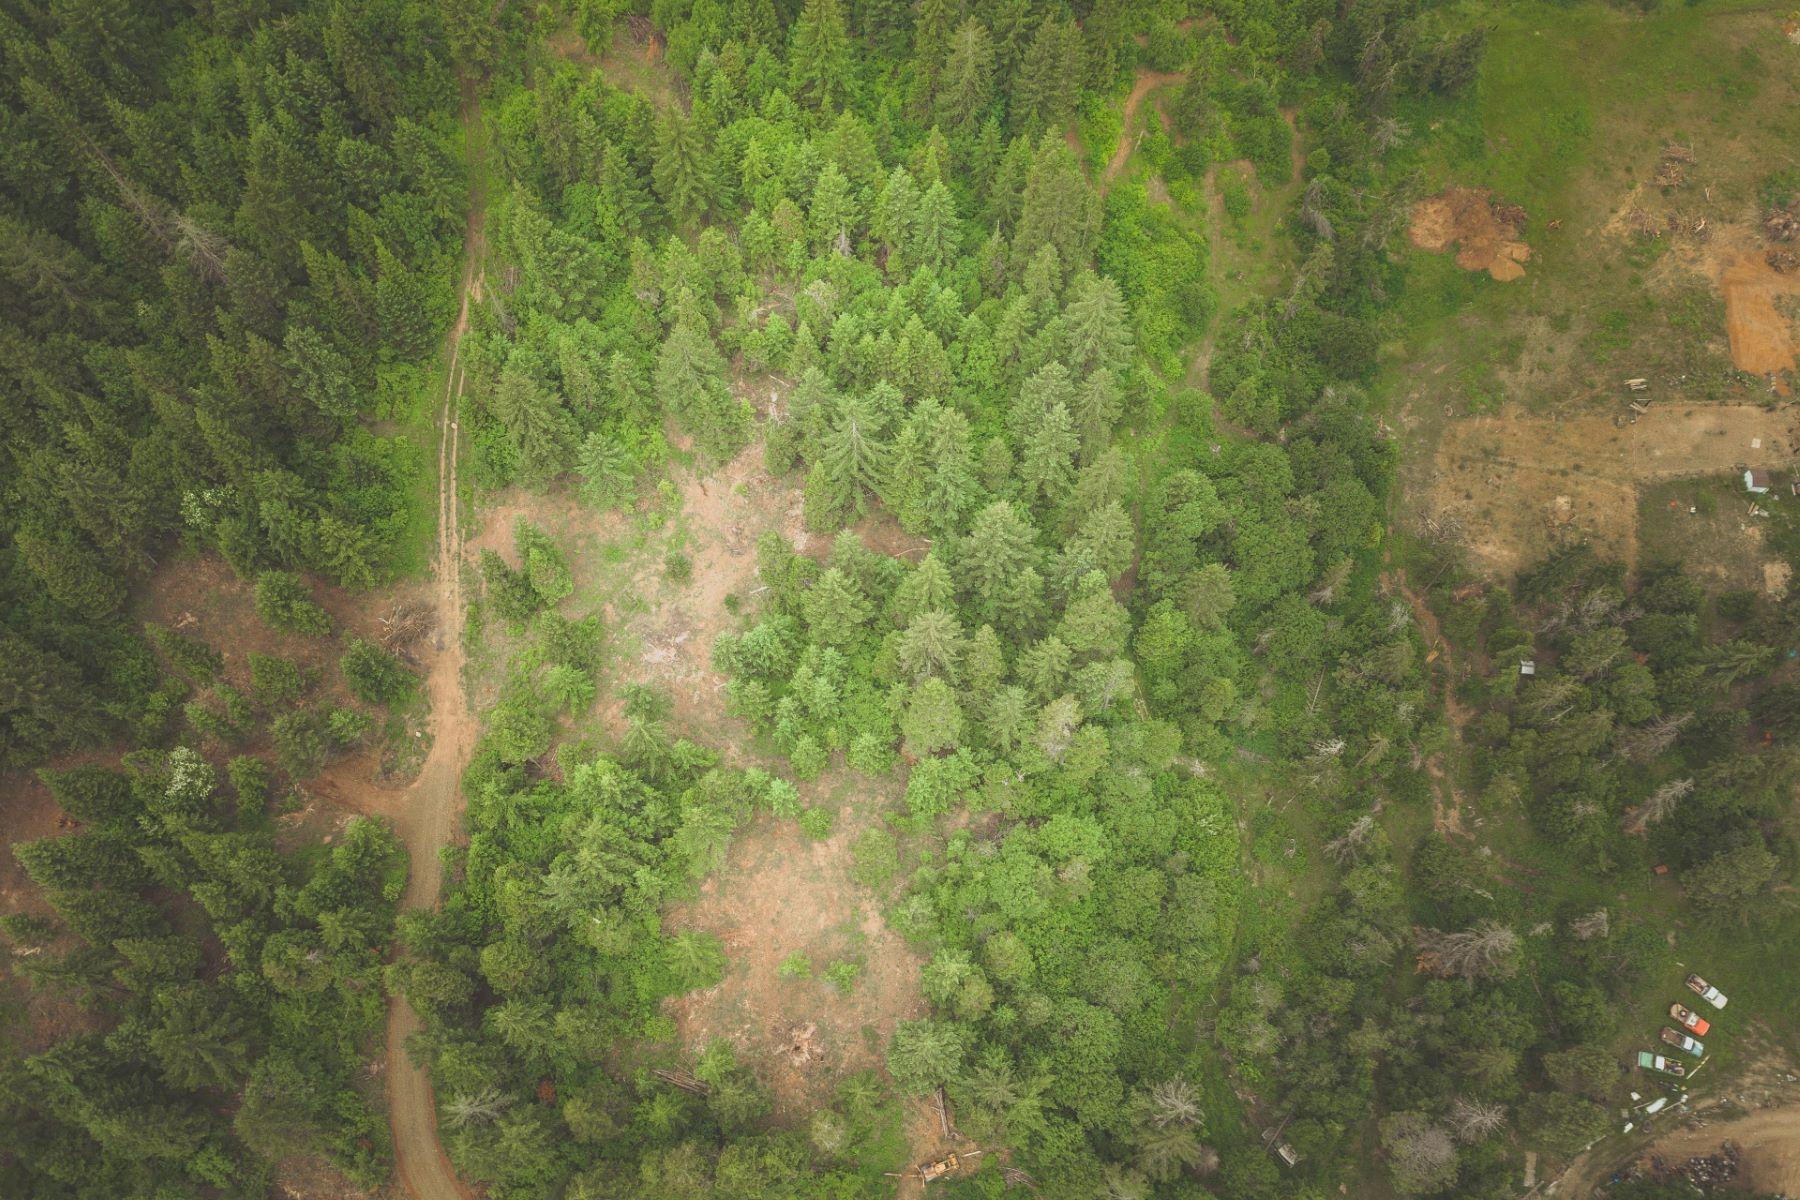 Land for Sale at Kida Road Lots White Salmon, Washington 98672 United States